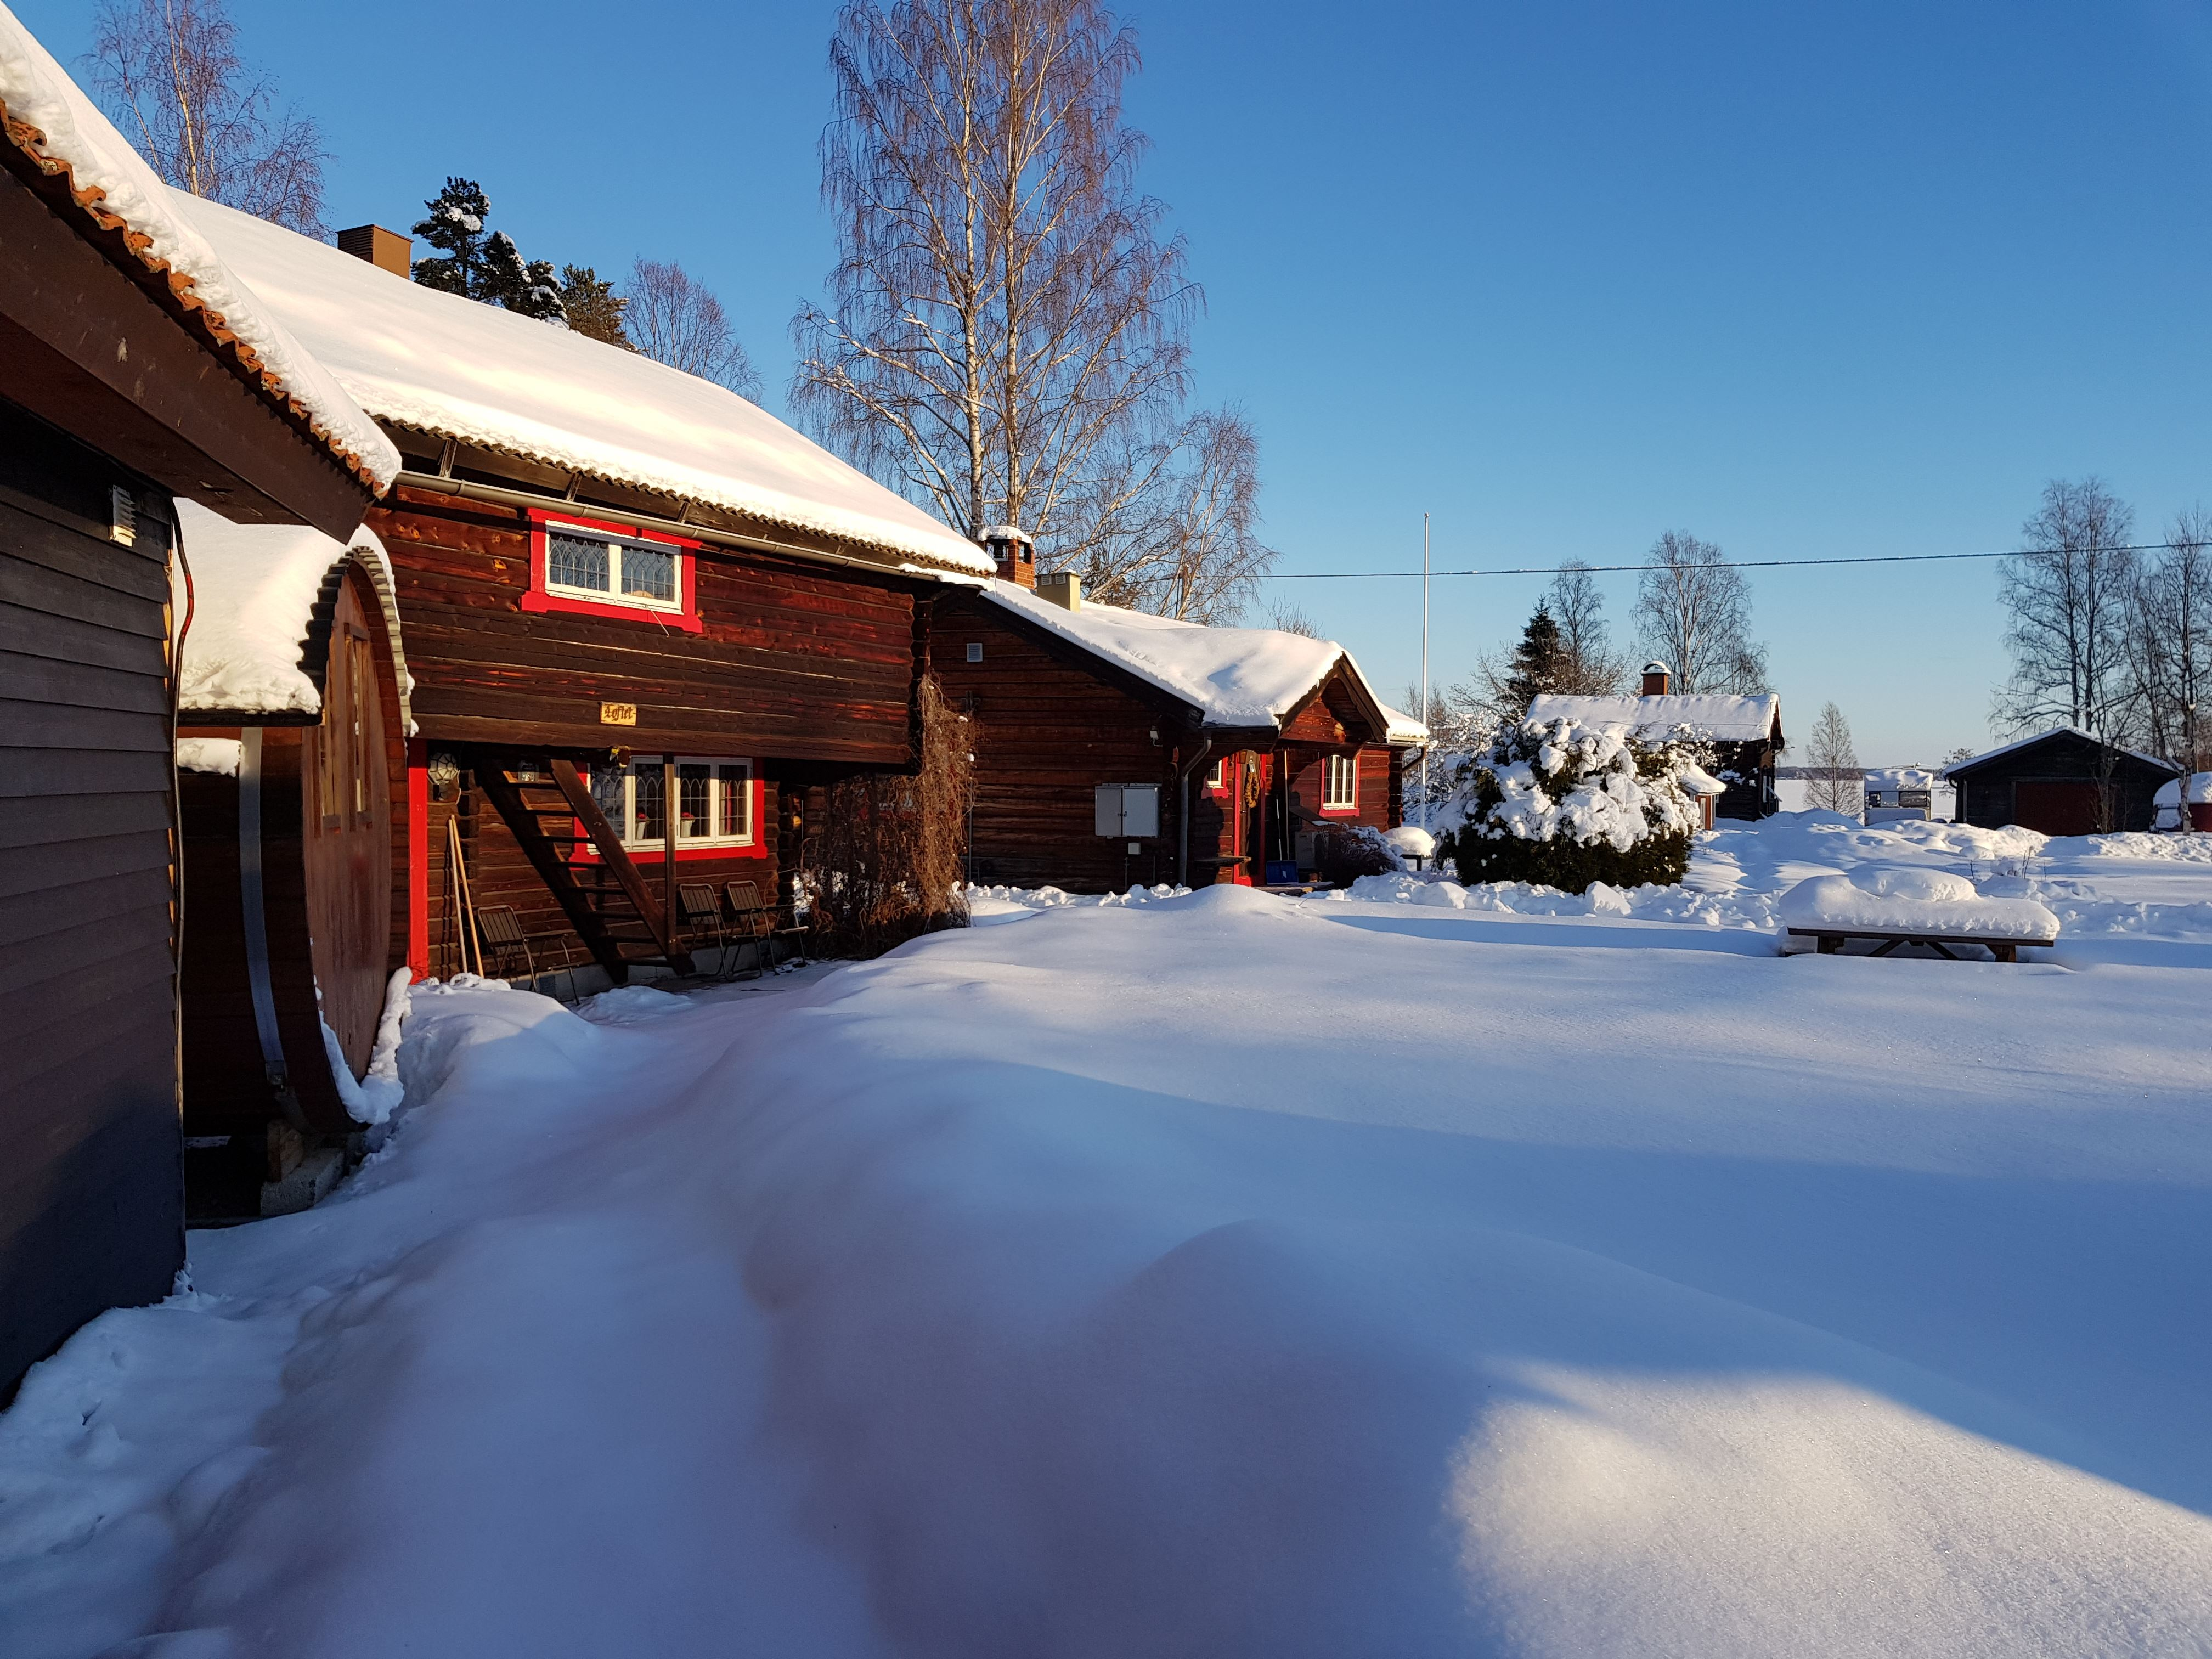 Åmåsängsgården Jugendherberge/Hostel